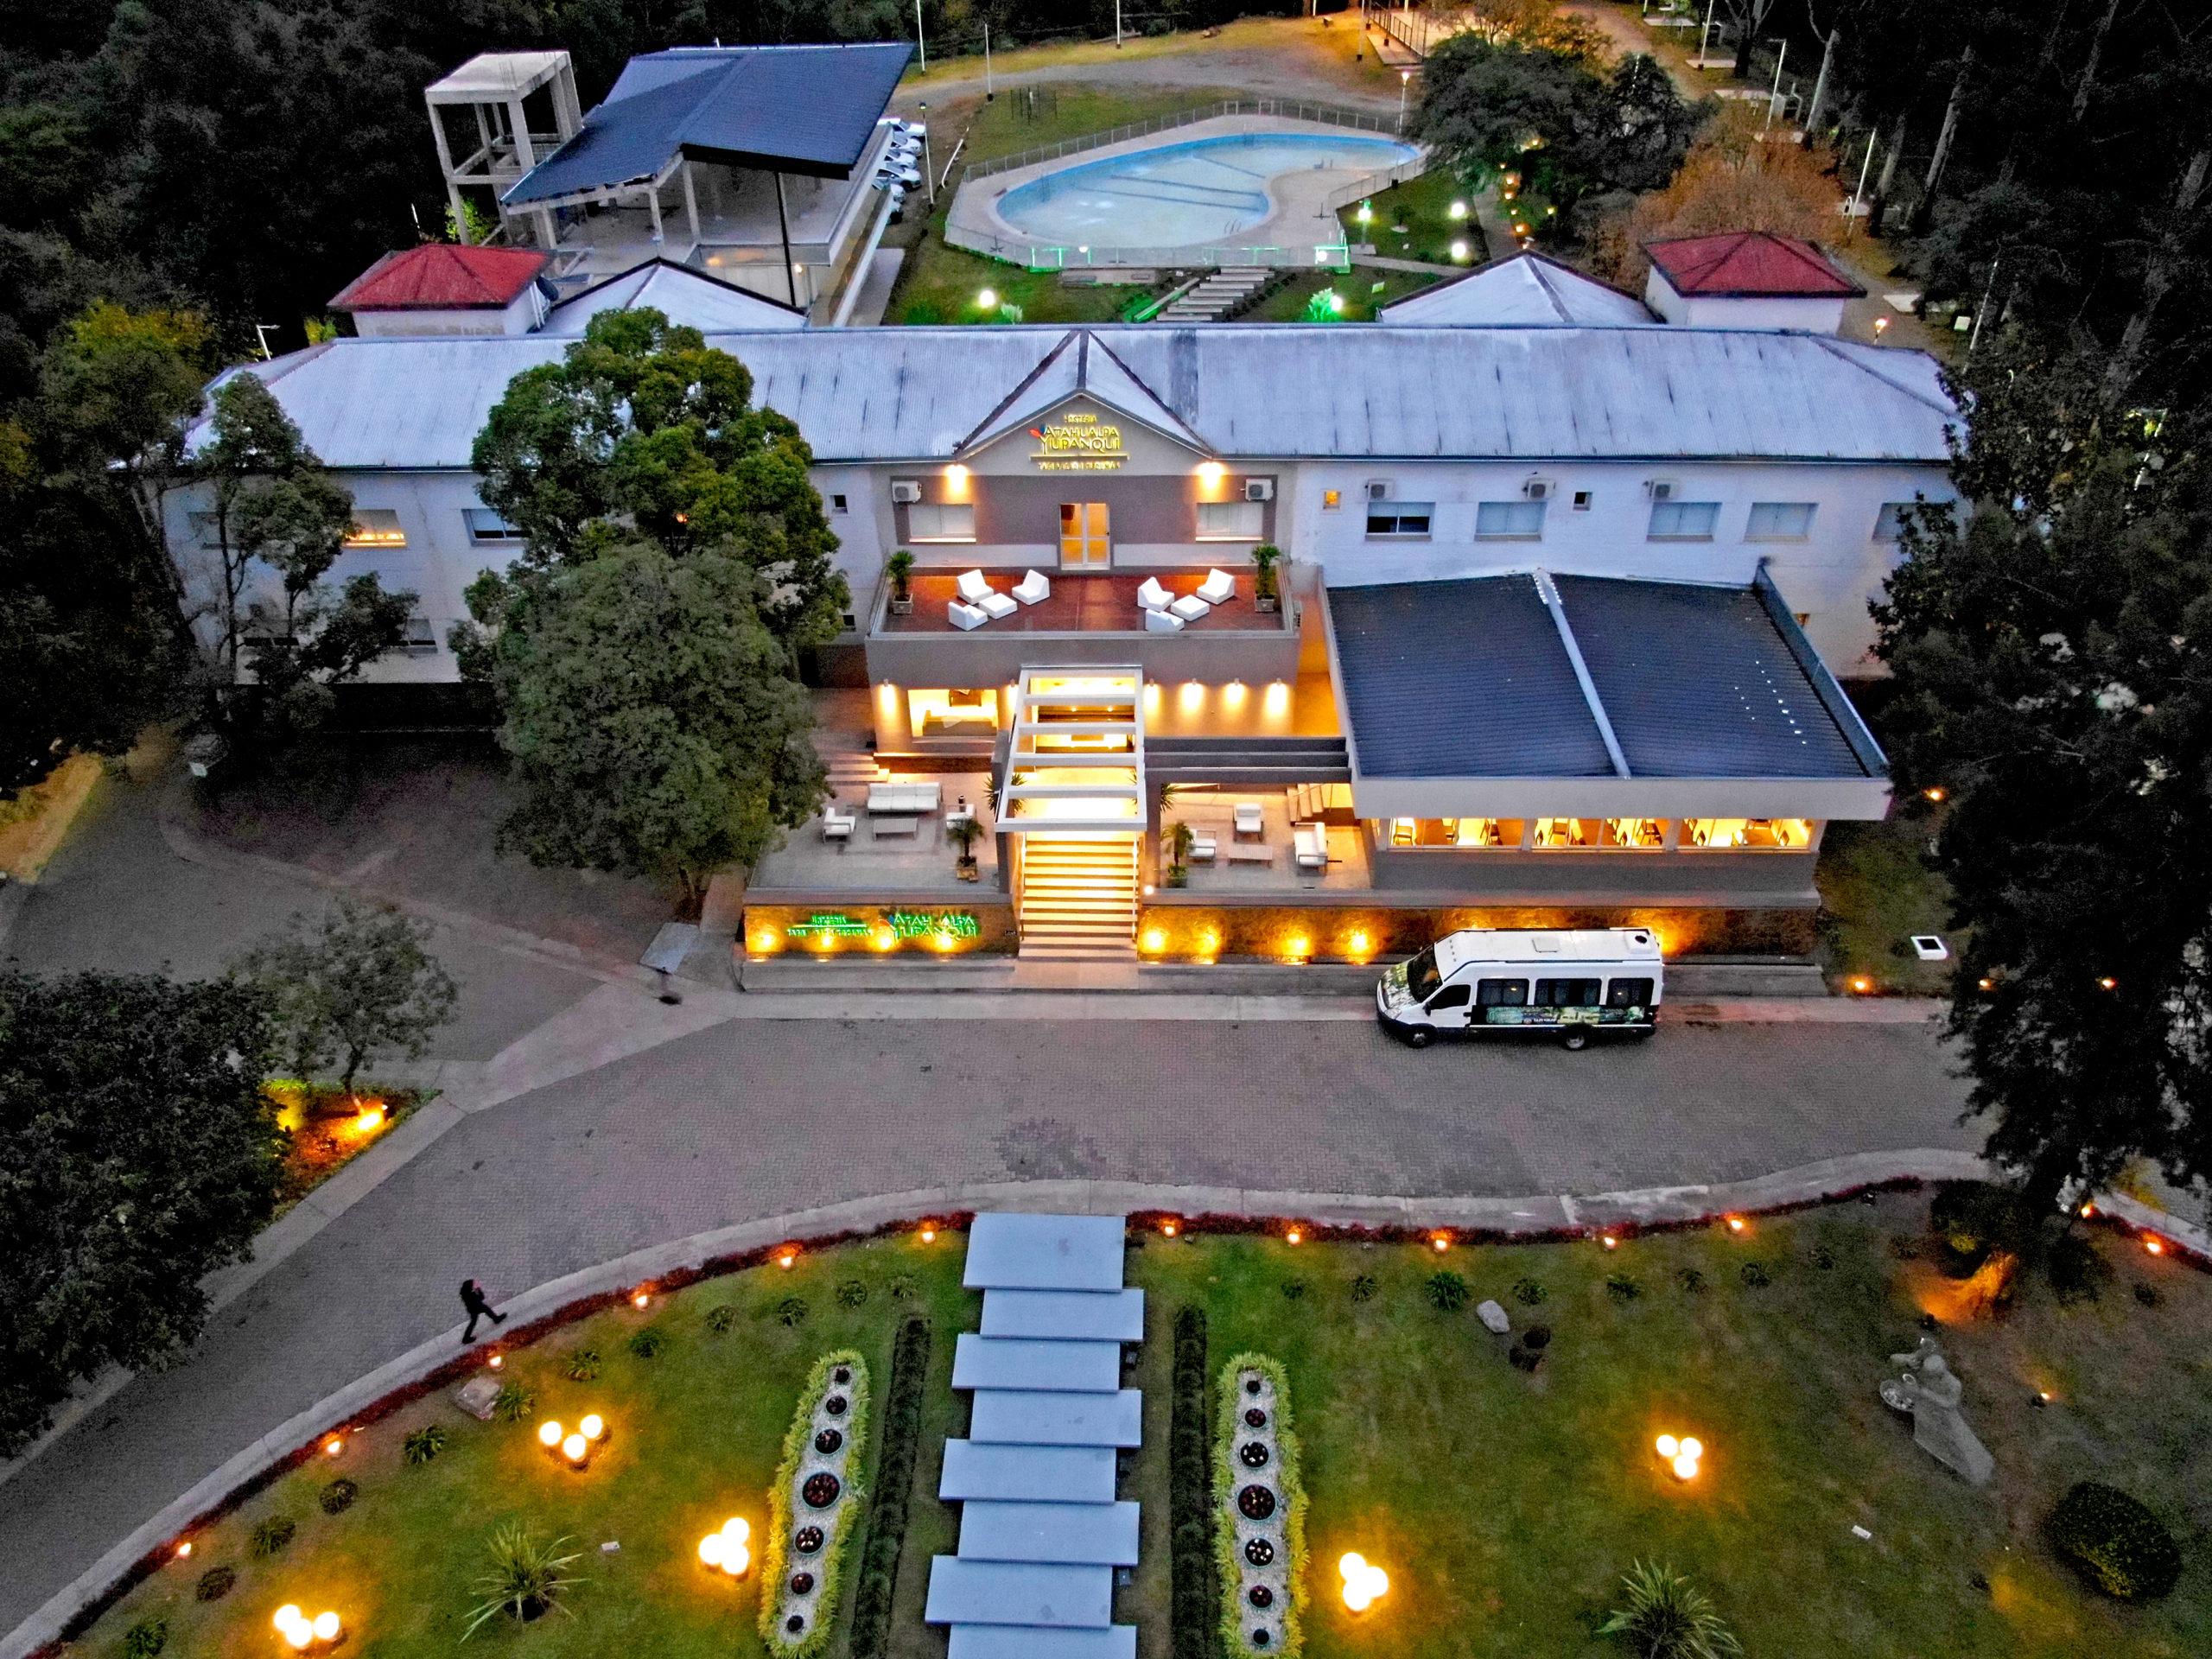 Numerosas personalidades eligen la hostería Atahualpa Yupanqui para alojarse